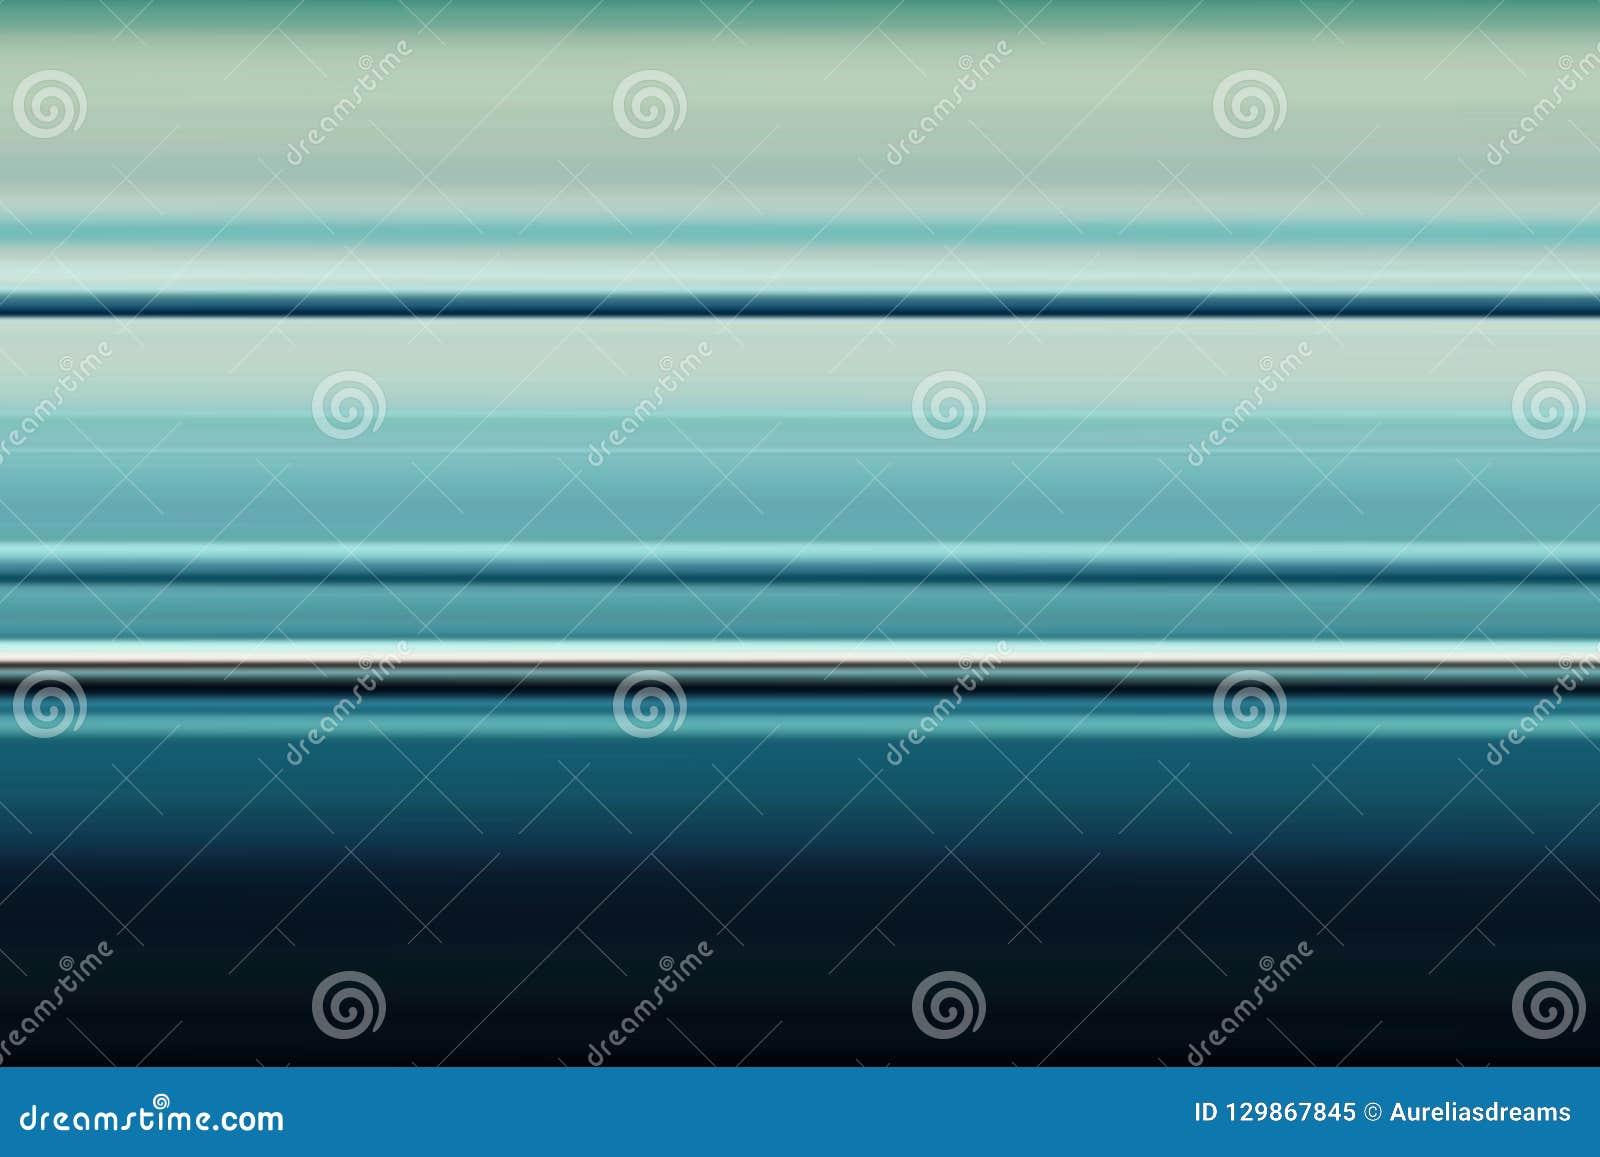 Olorful αφηρημένο φωτεινό υπόβαθρο οριζόντιων γραμμών Ð ¡, σύσταση στους μπλε τόνους